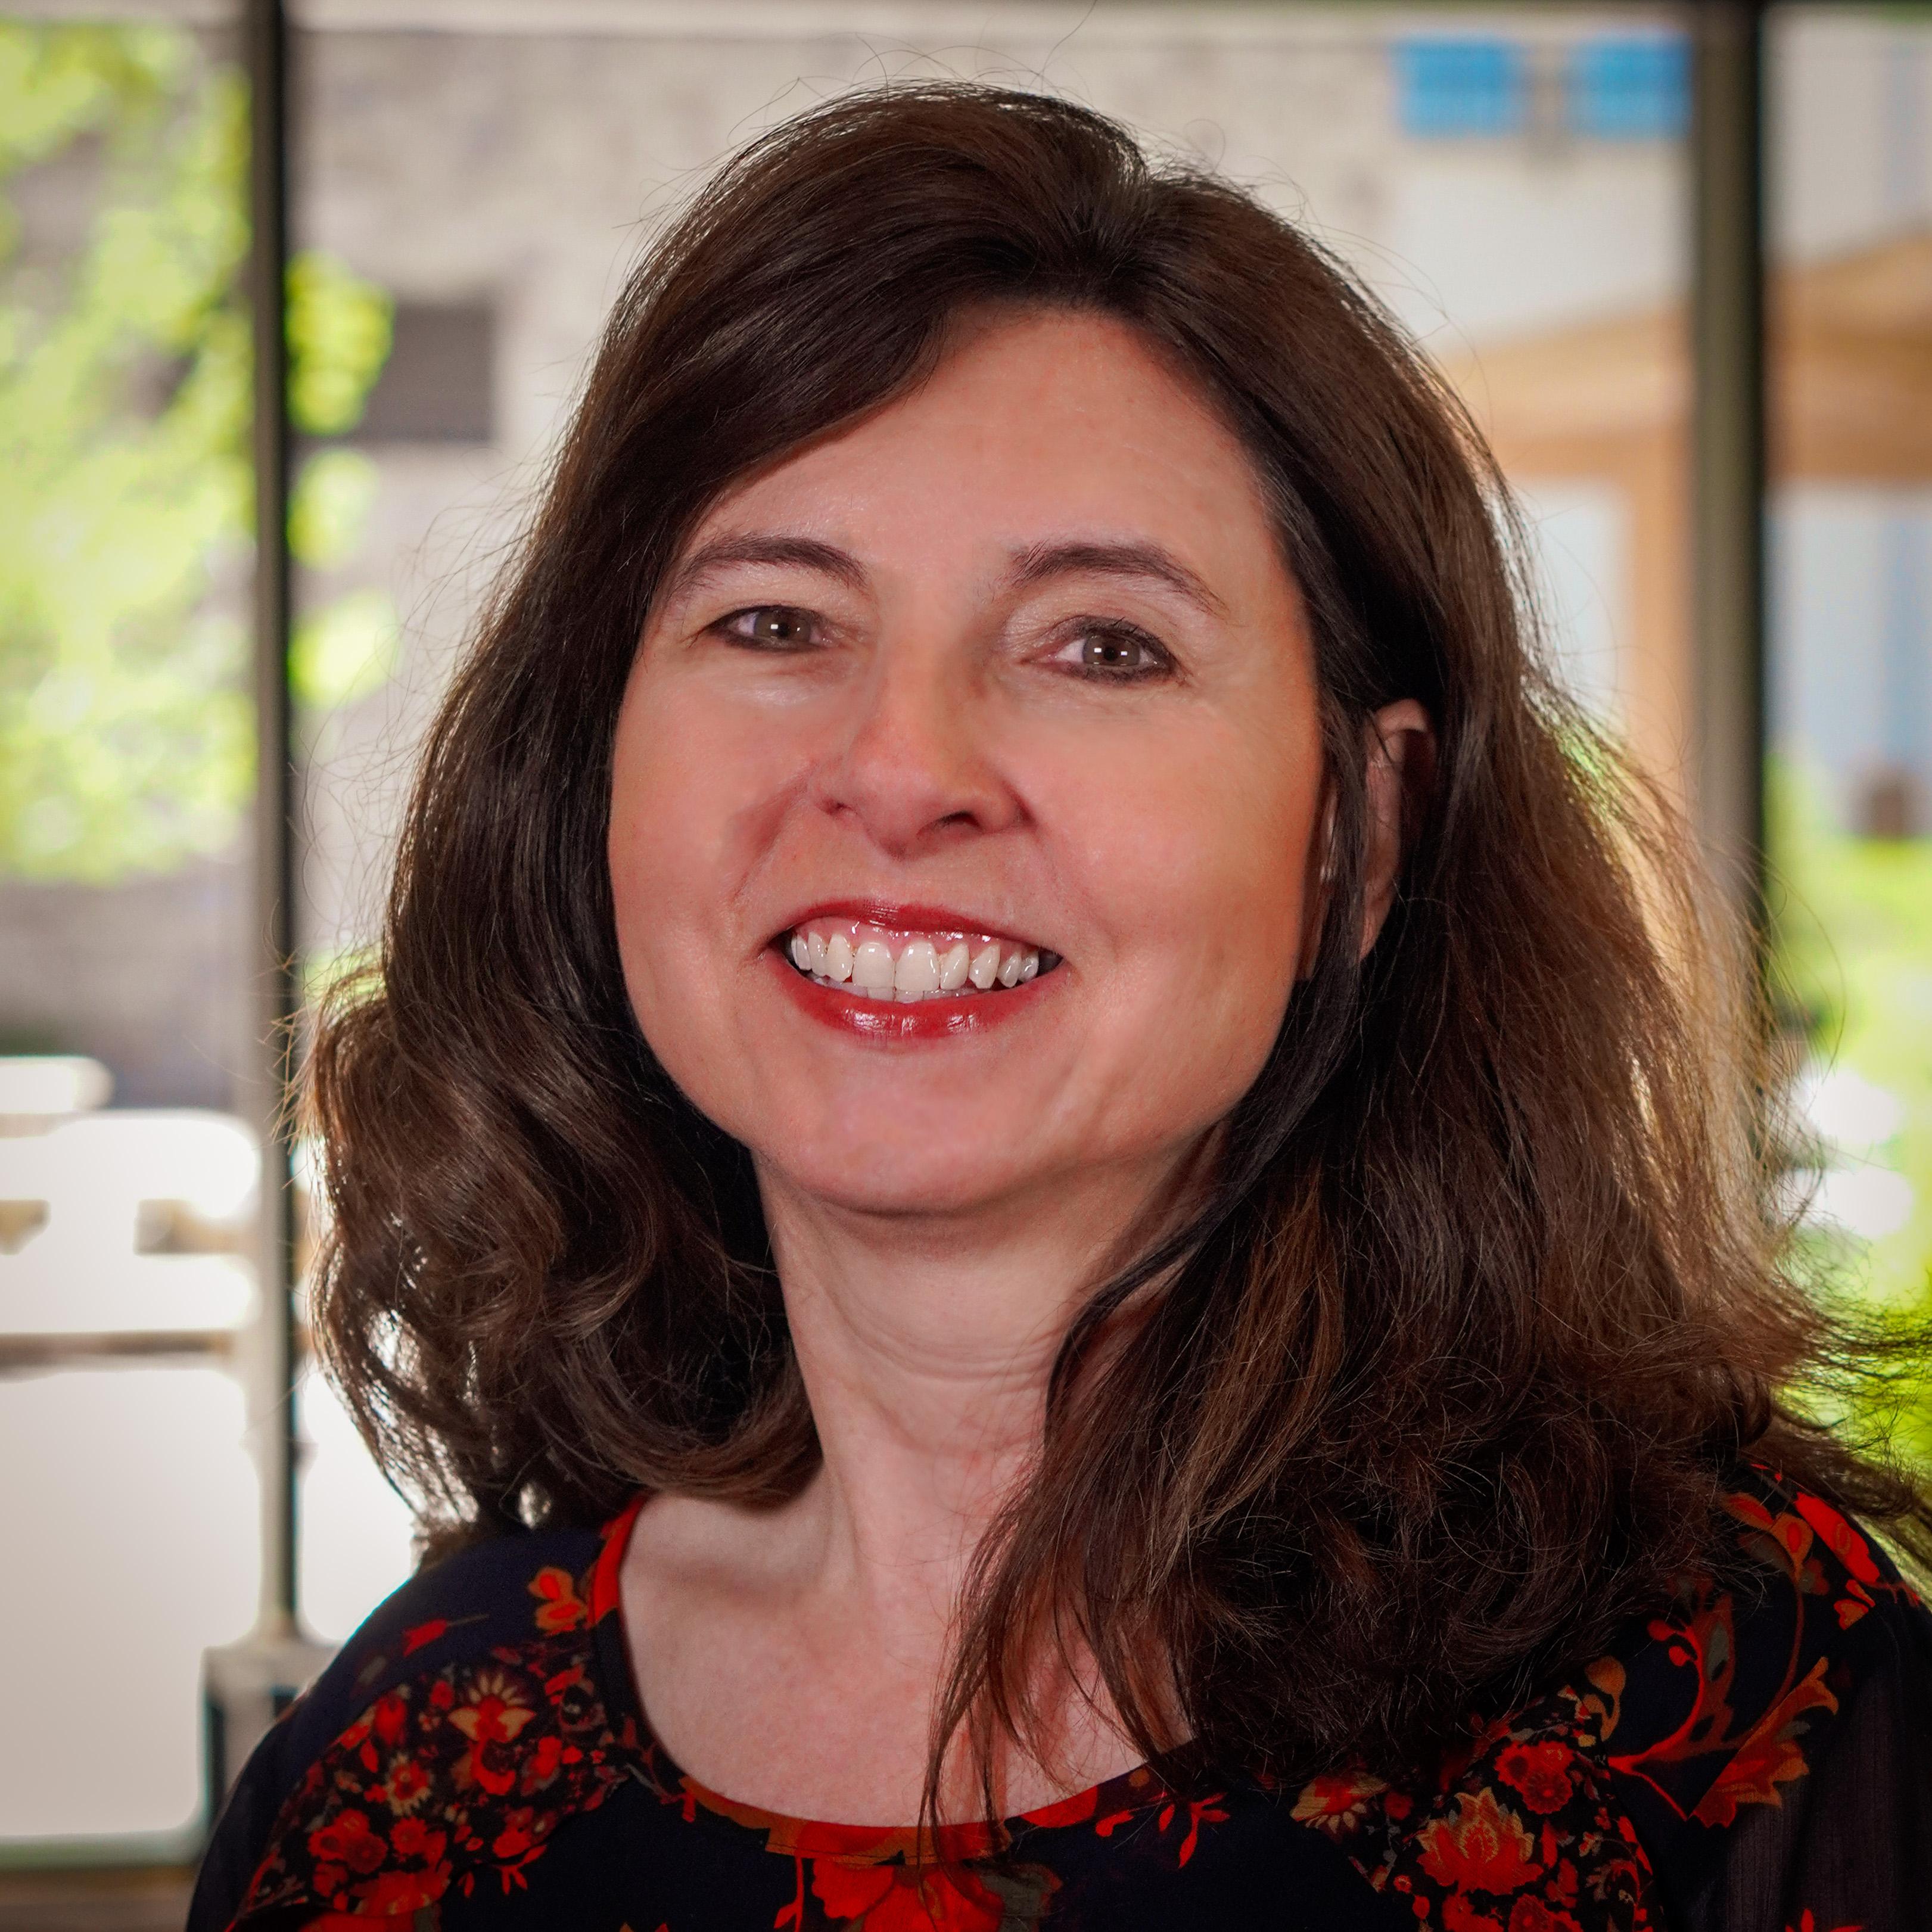 Corinne Brown